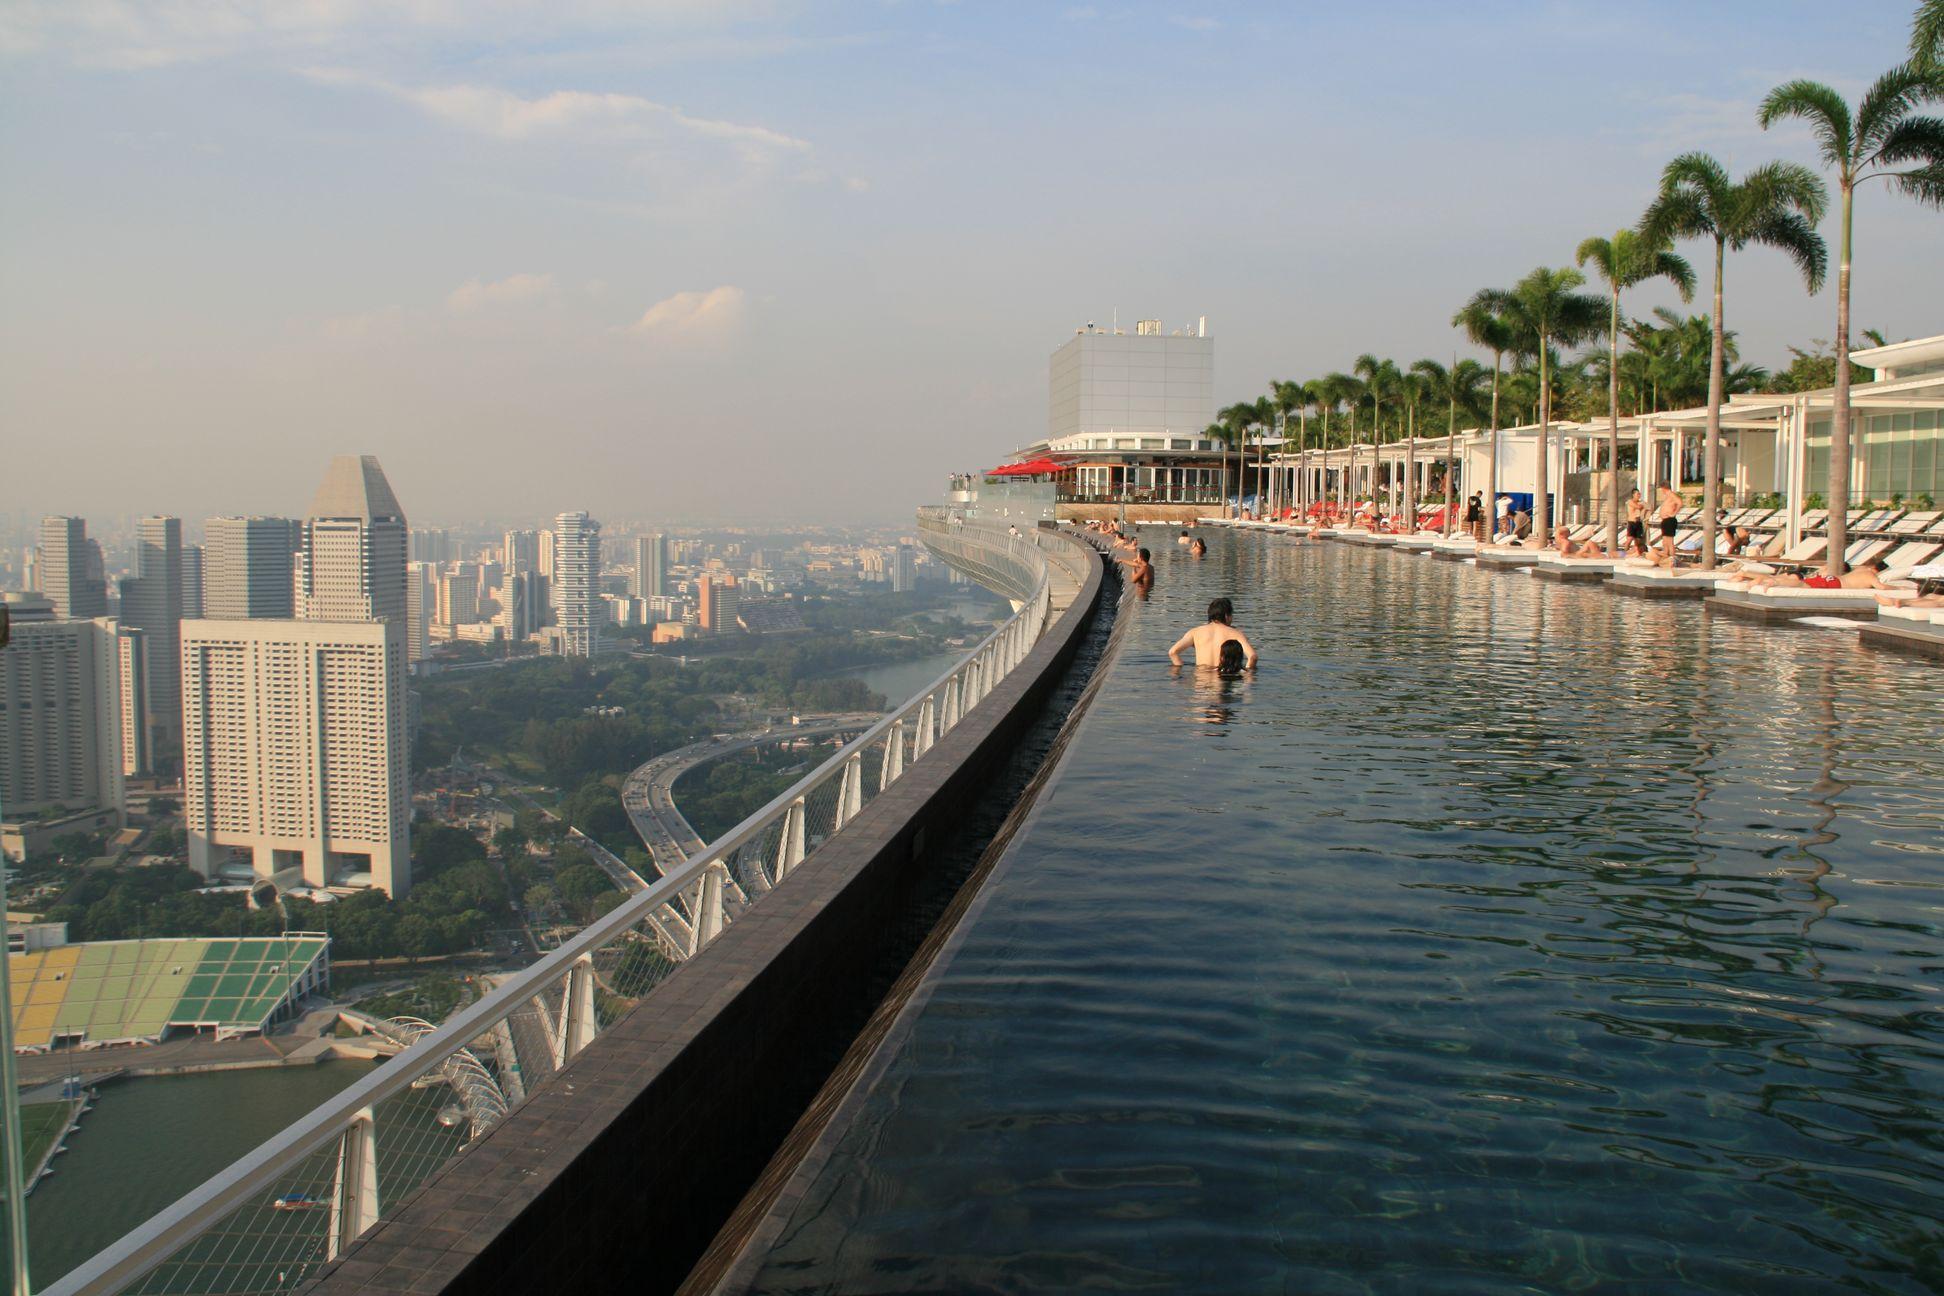 Frenchman in Singapore